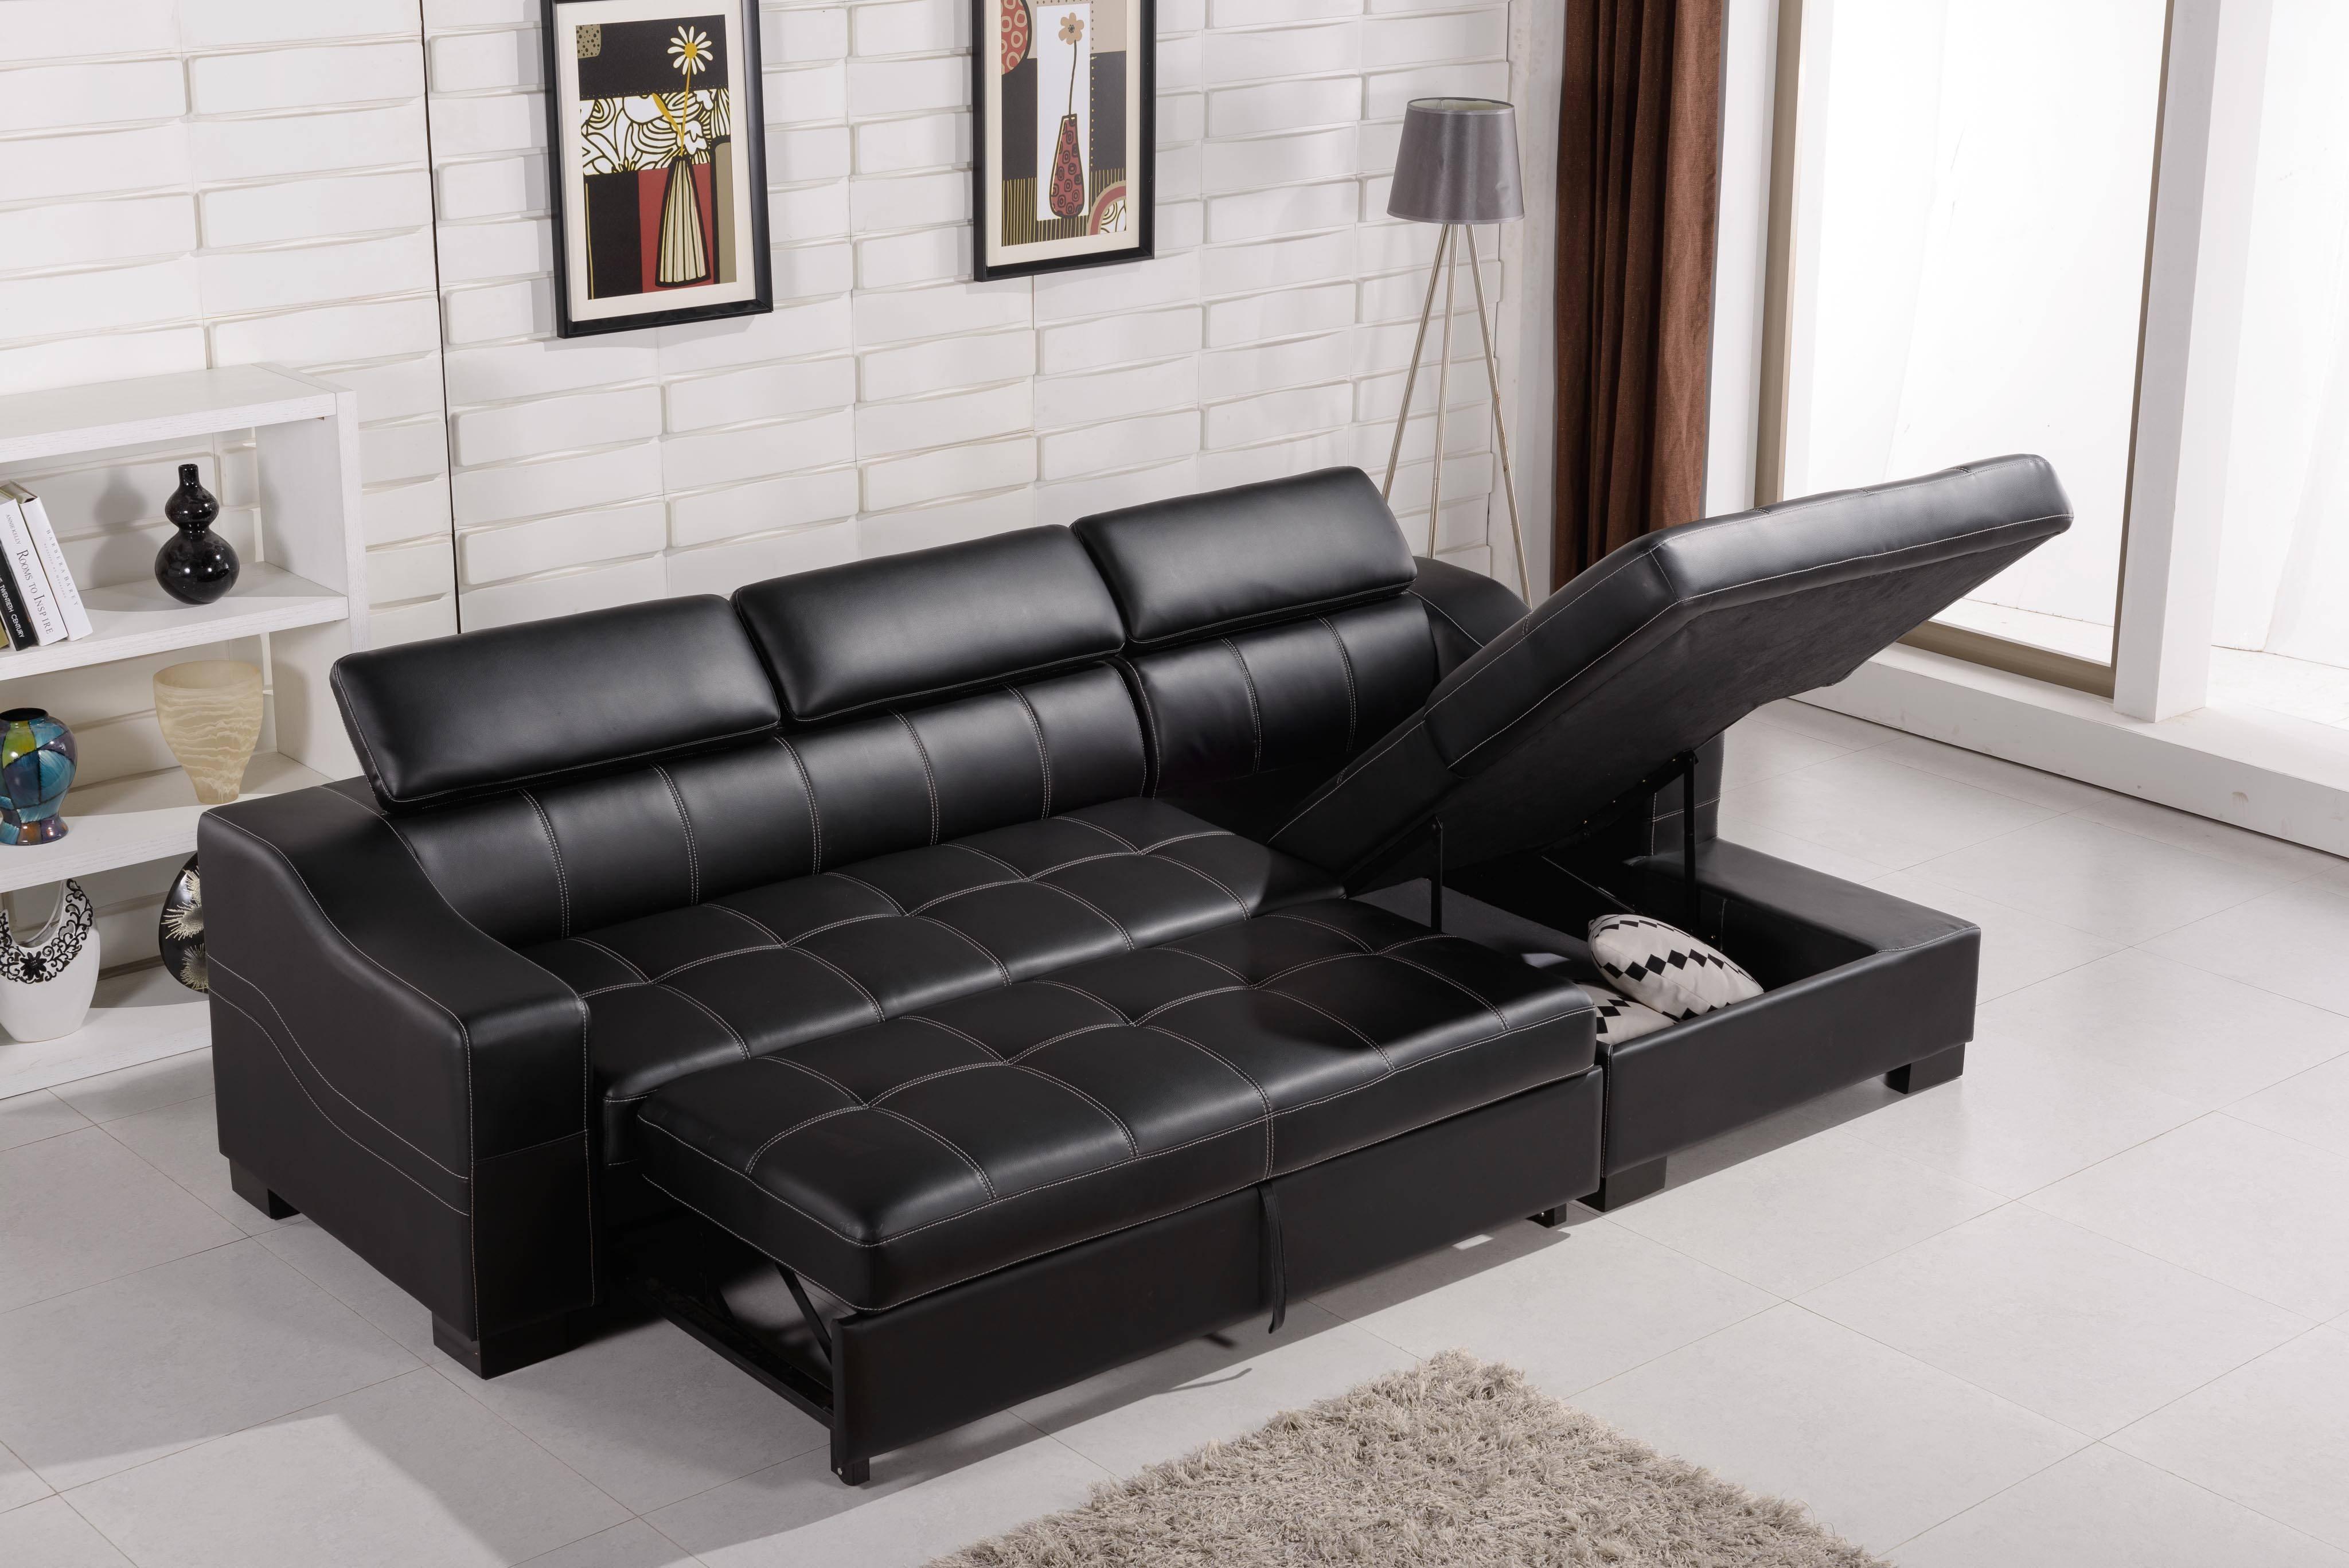 Sleeper Sectional Sofa With Storage | Tehranmix Decoration pertaining to Sectional Sofa With Storage (Image 21 of 25)